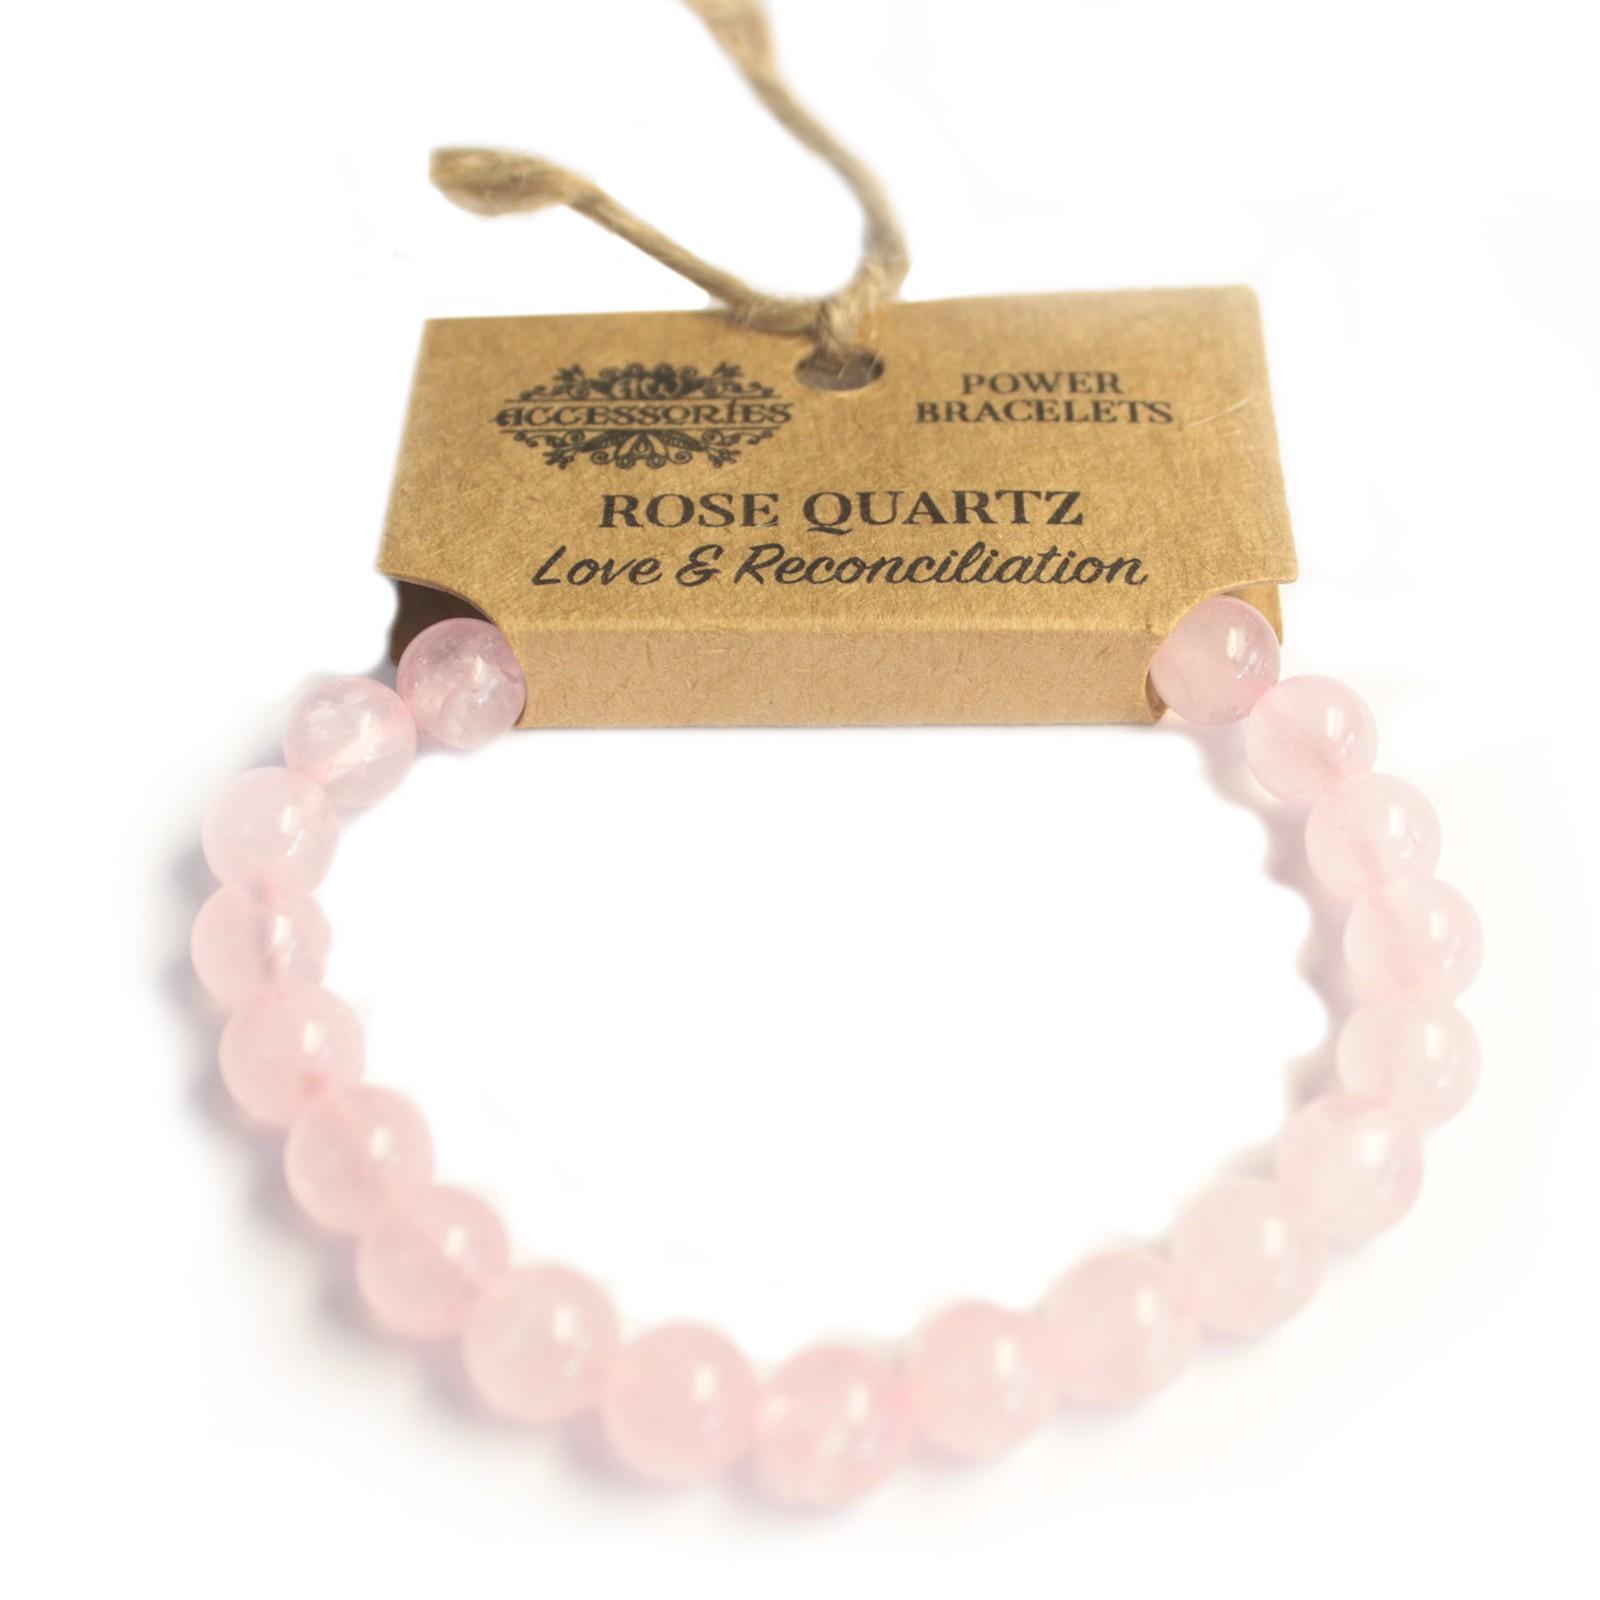 Power Bracelet Rose Quartz